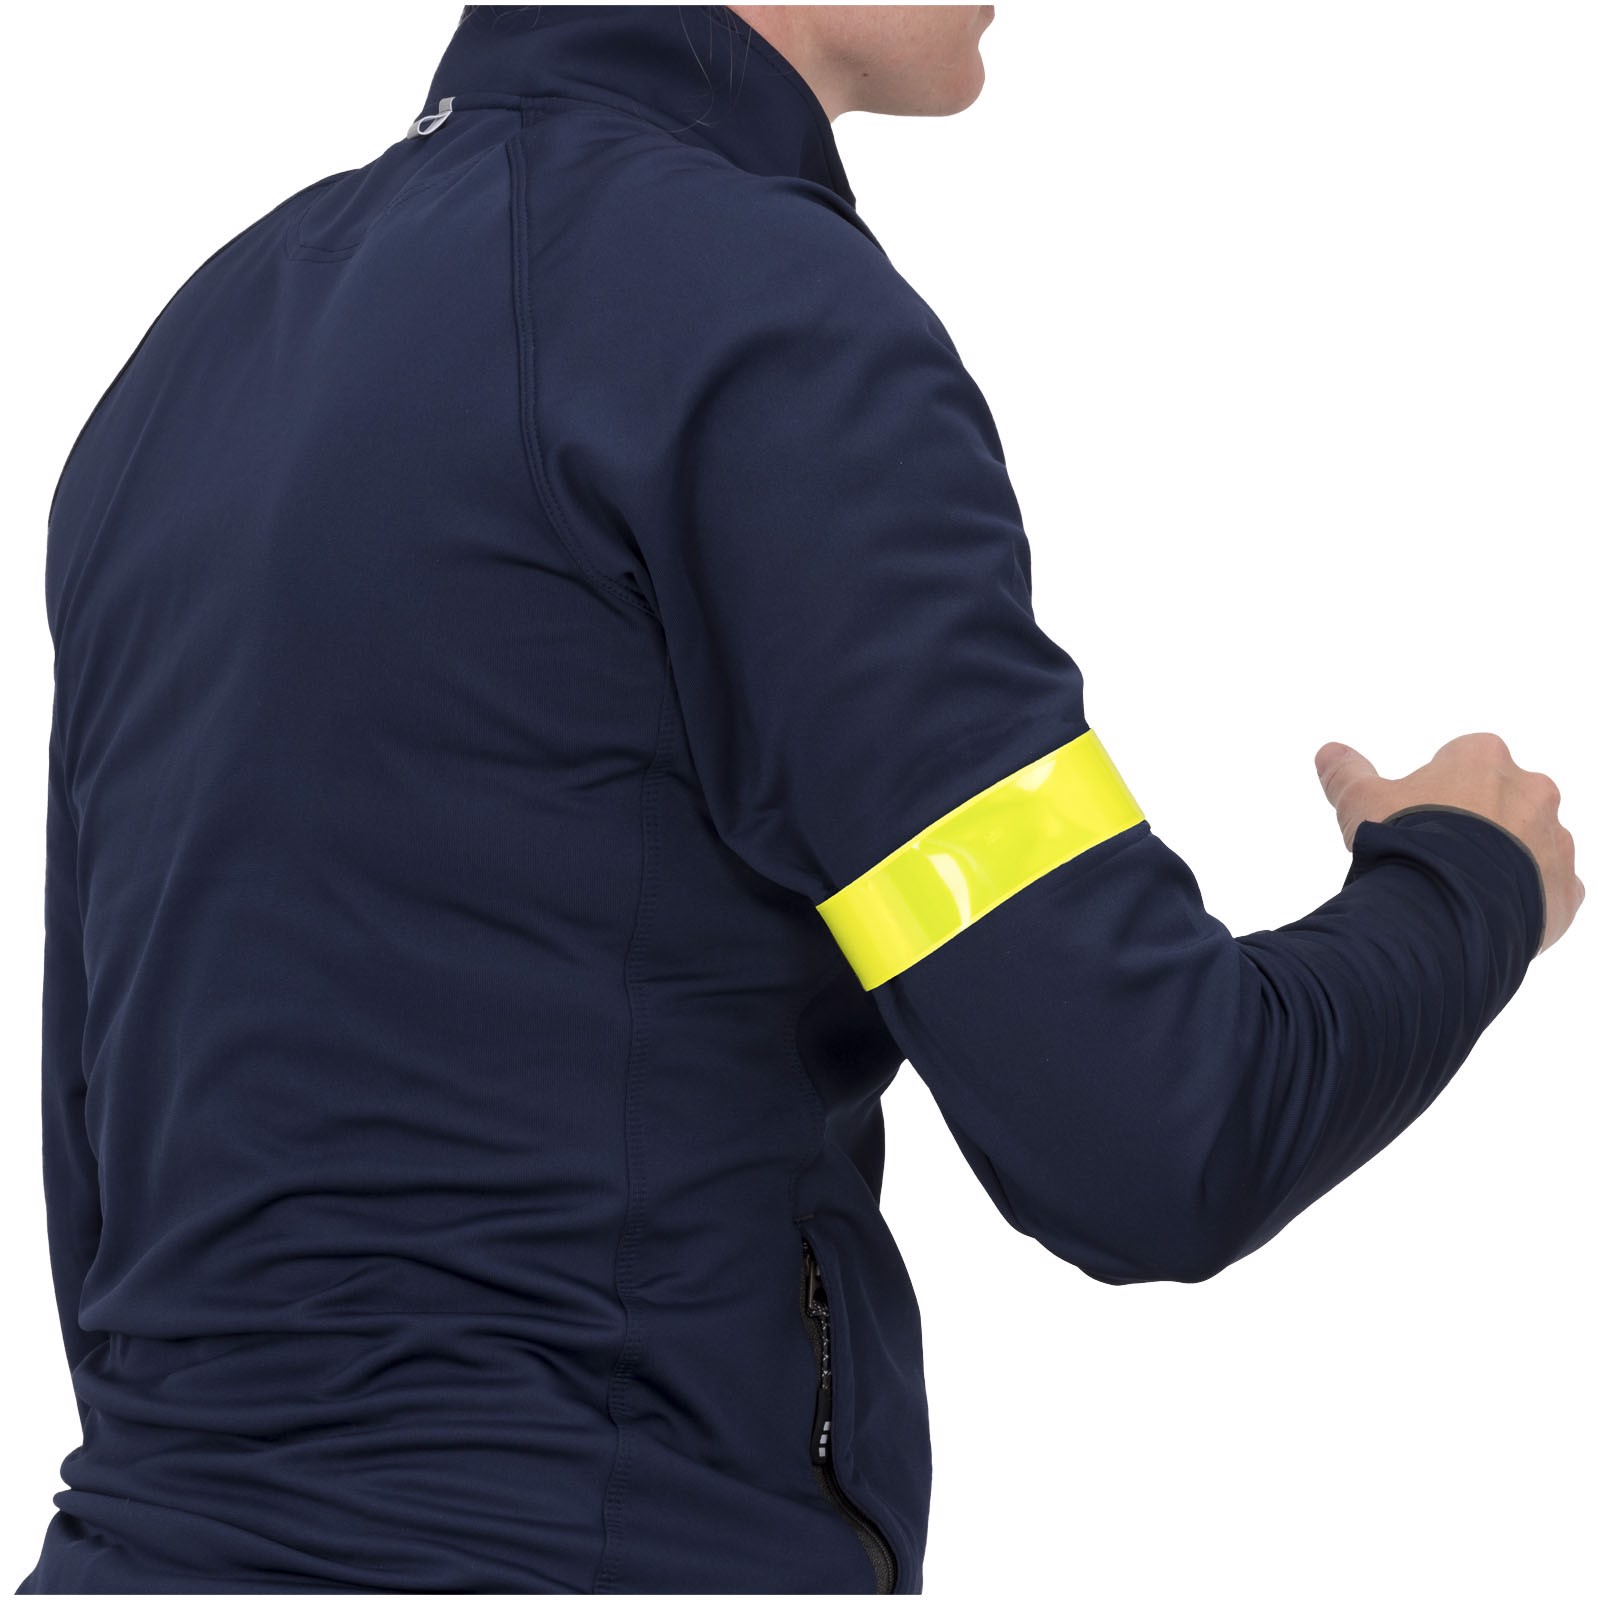 Reflective slap wrap small - Yellow